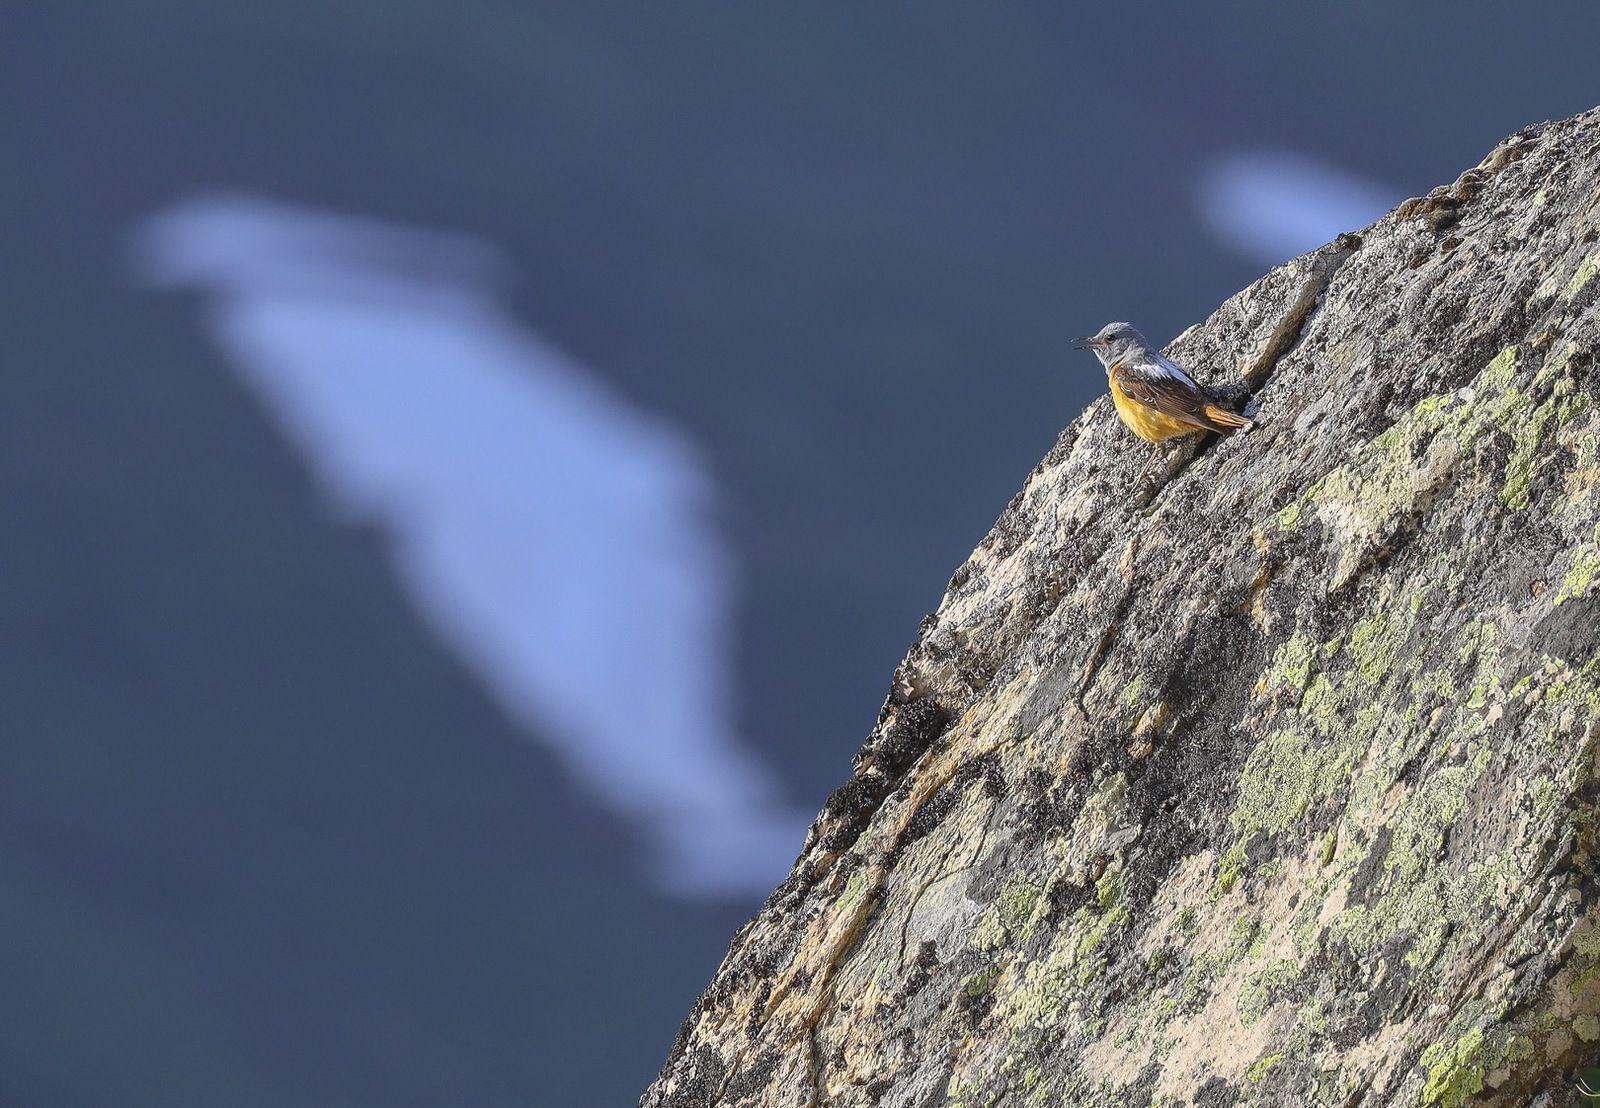 Le monticole de roche, mâle